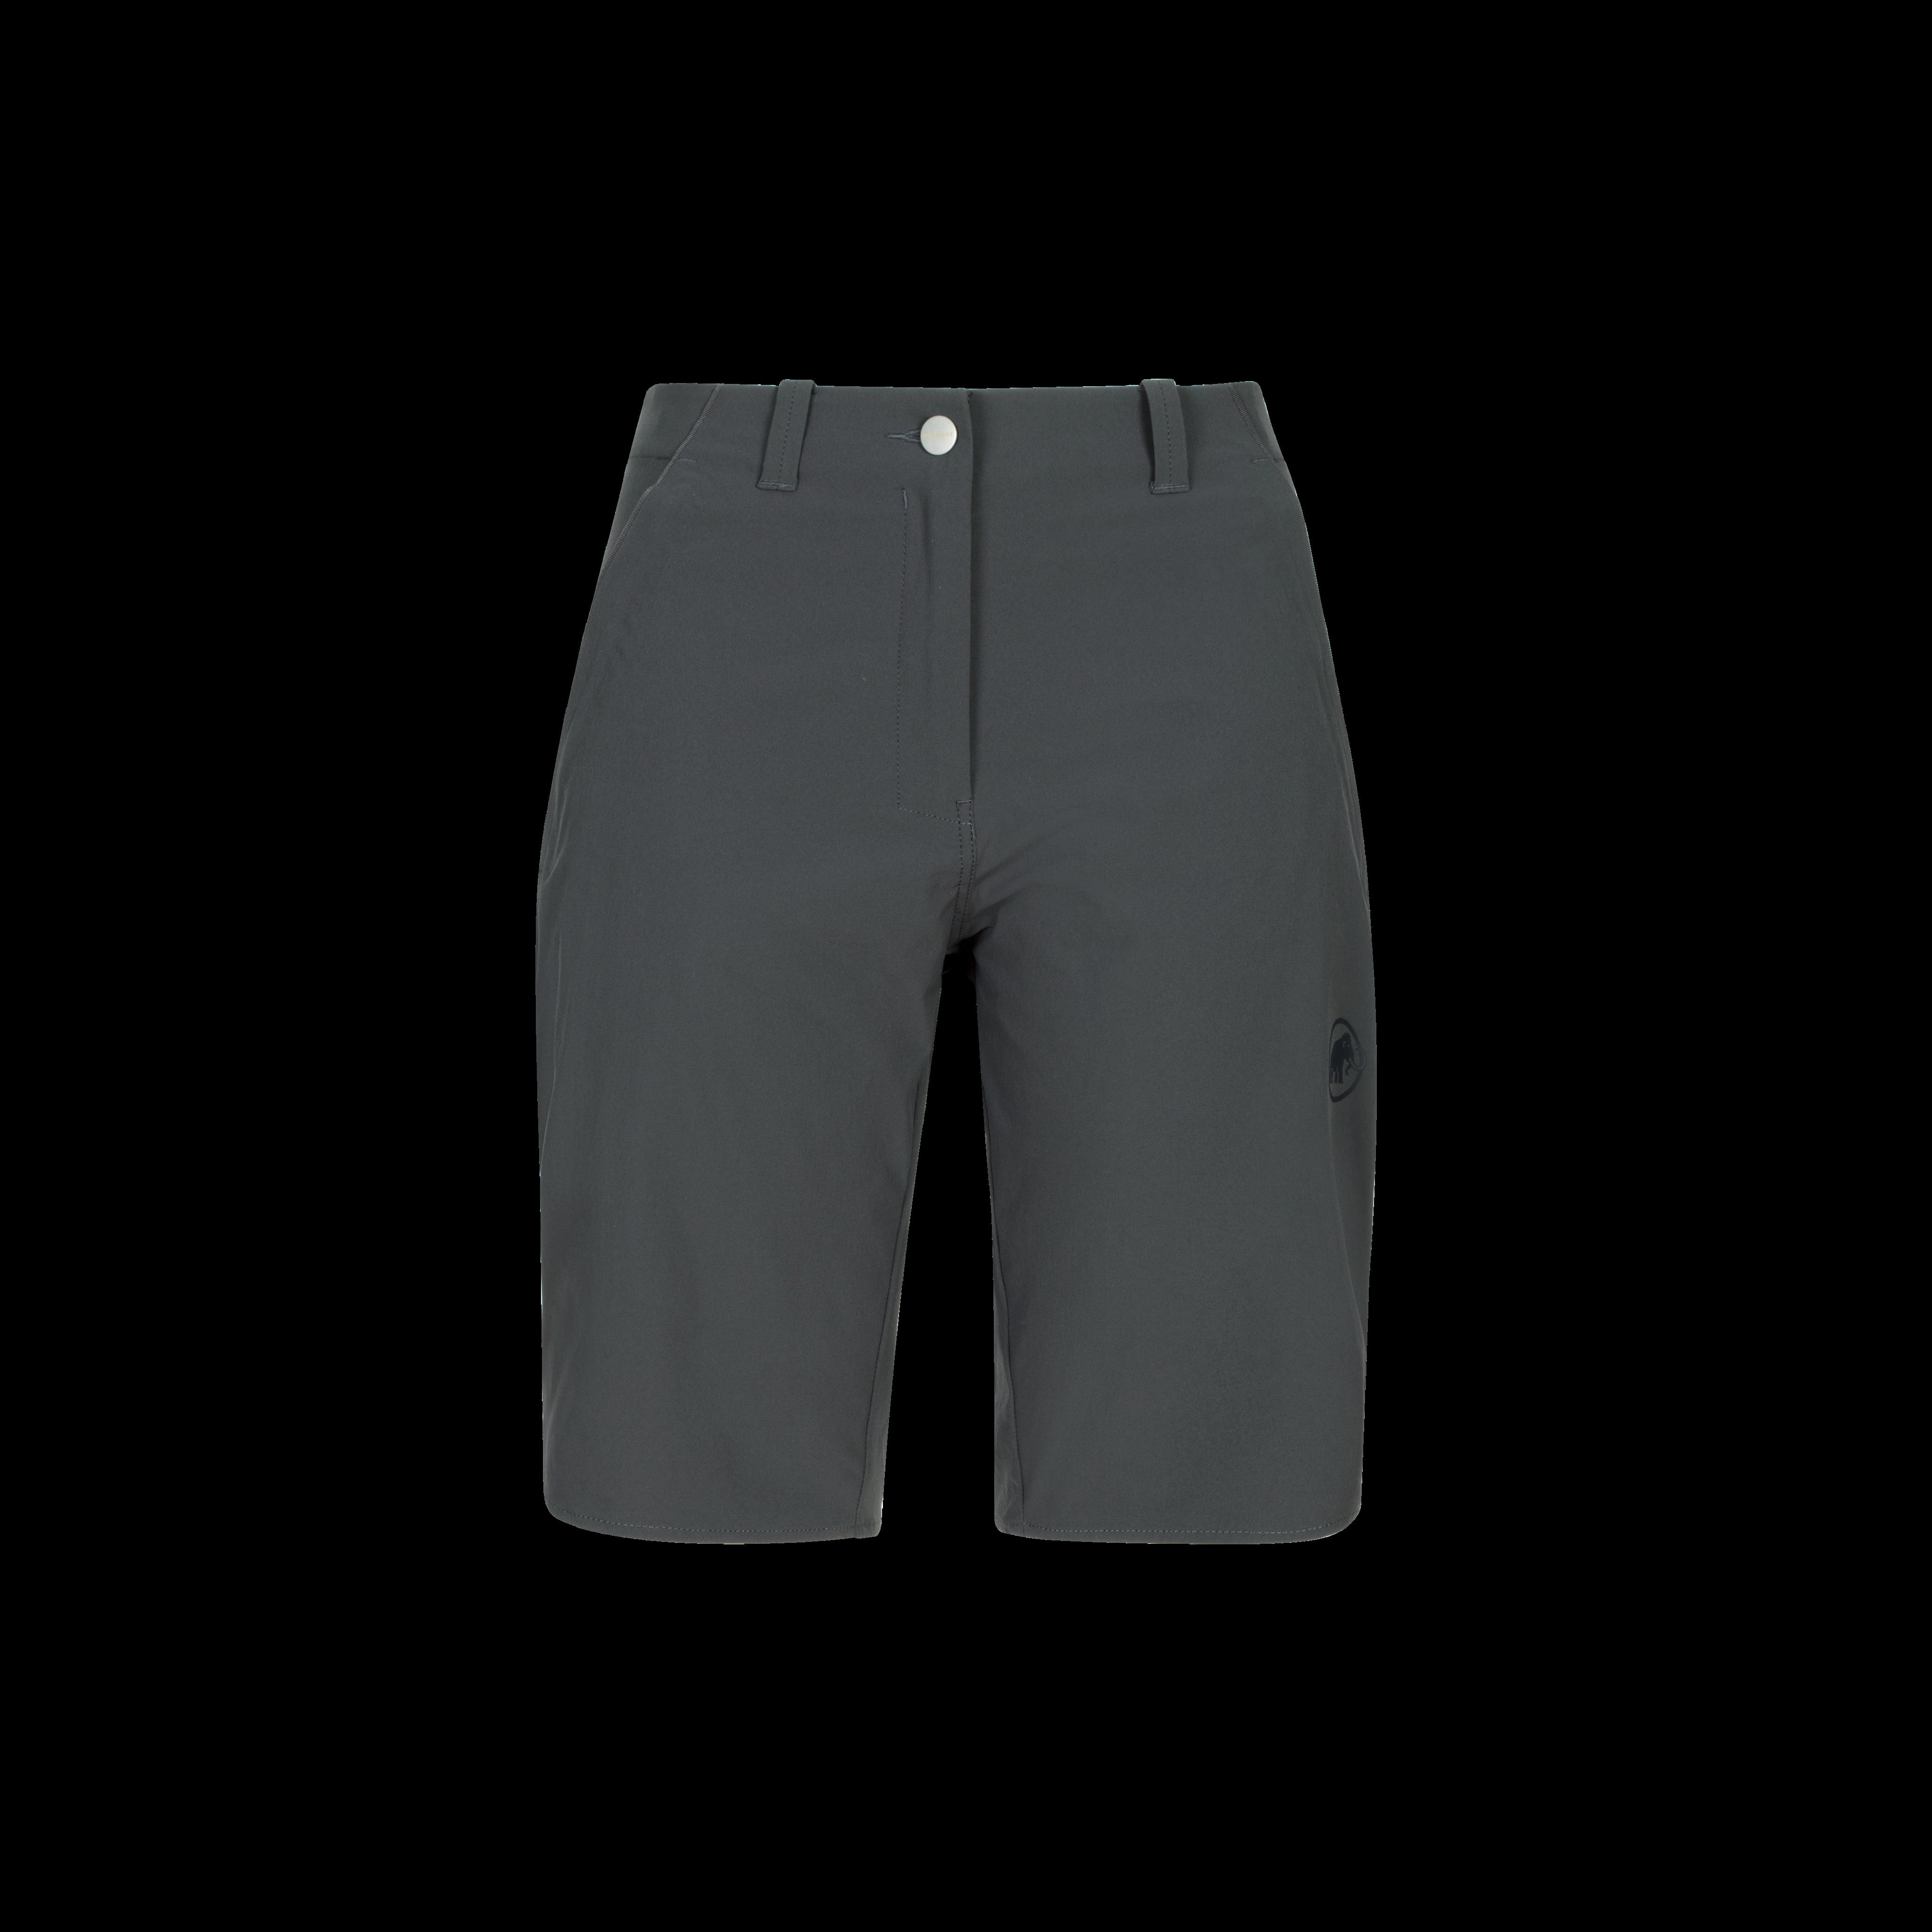 Runbold Shorts Women - phantom, UK 12 thumbnail